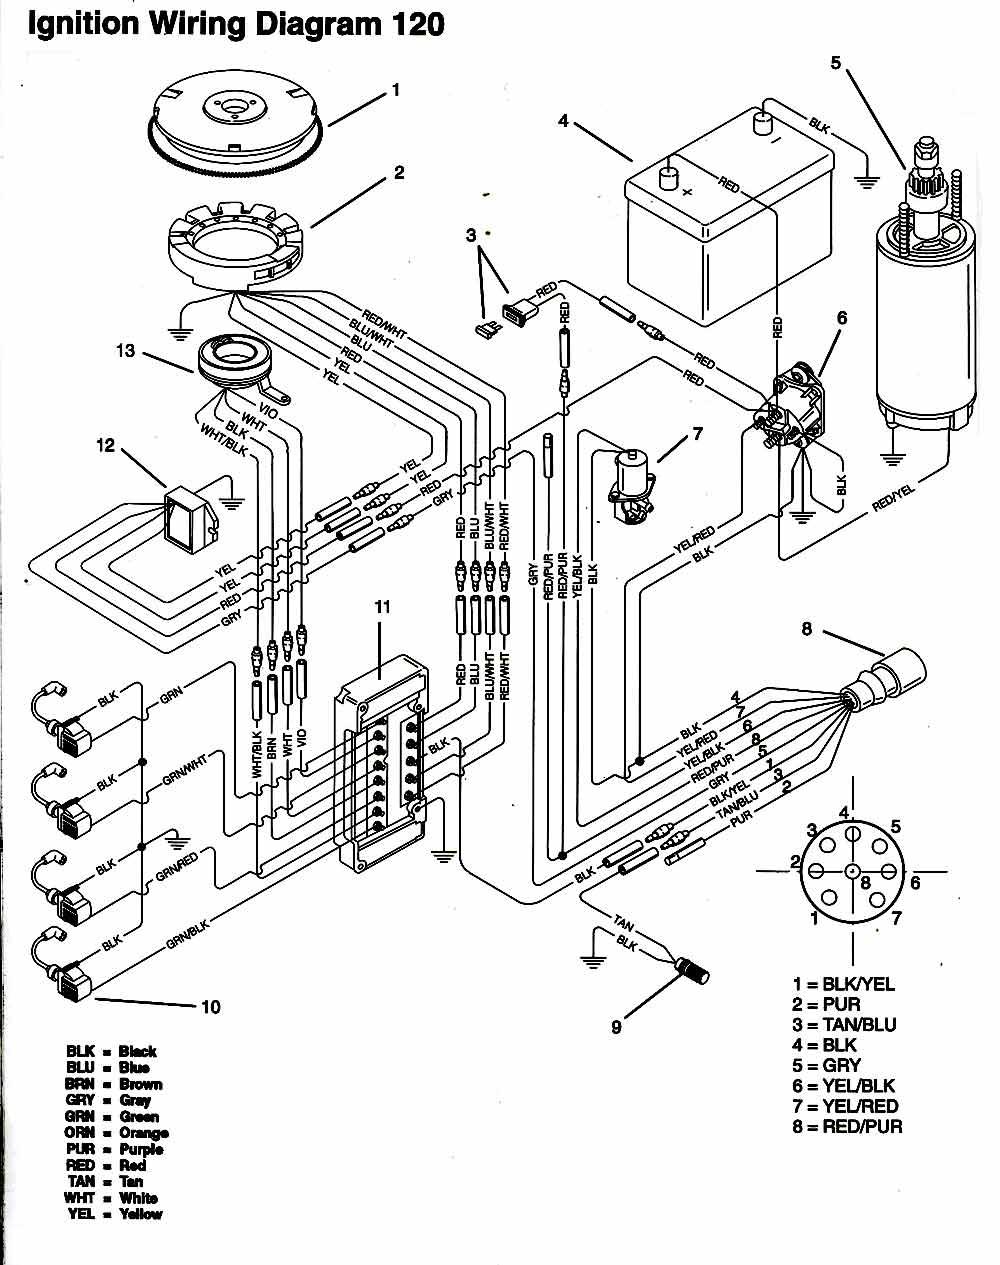 Yamaha 85 Outboard Wiring On Motor : A yamaha outboard